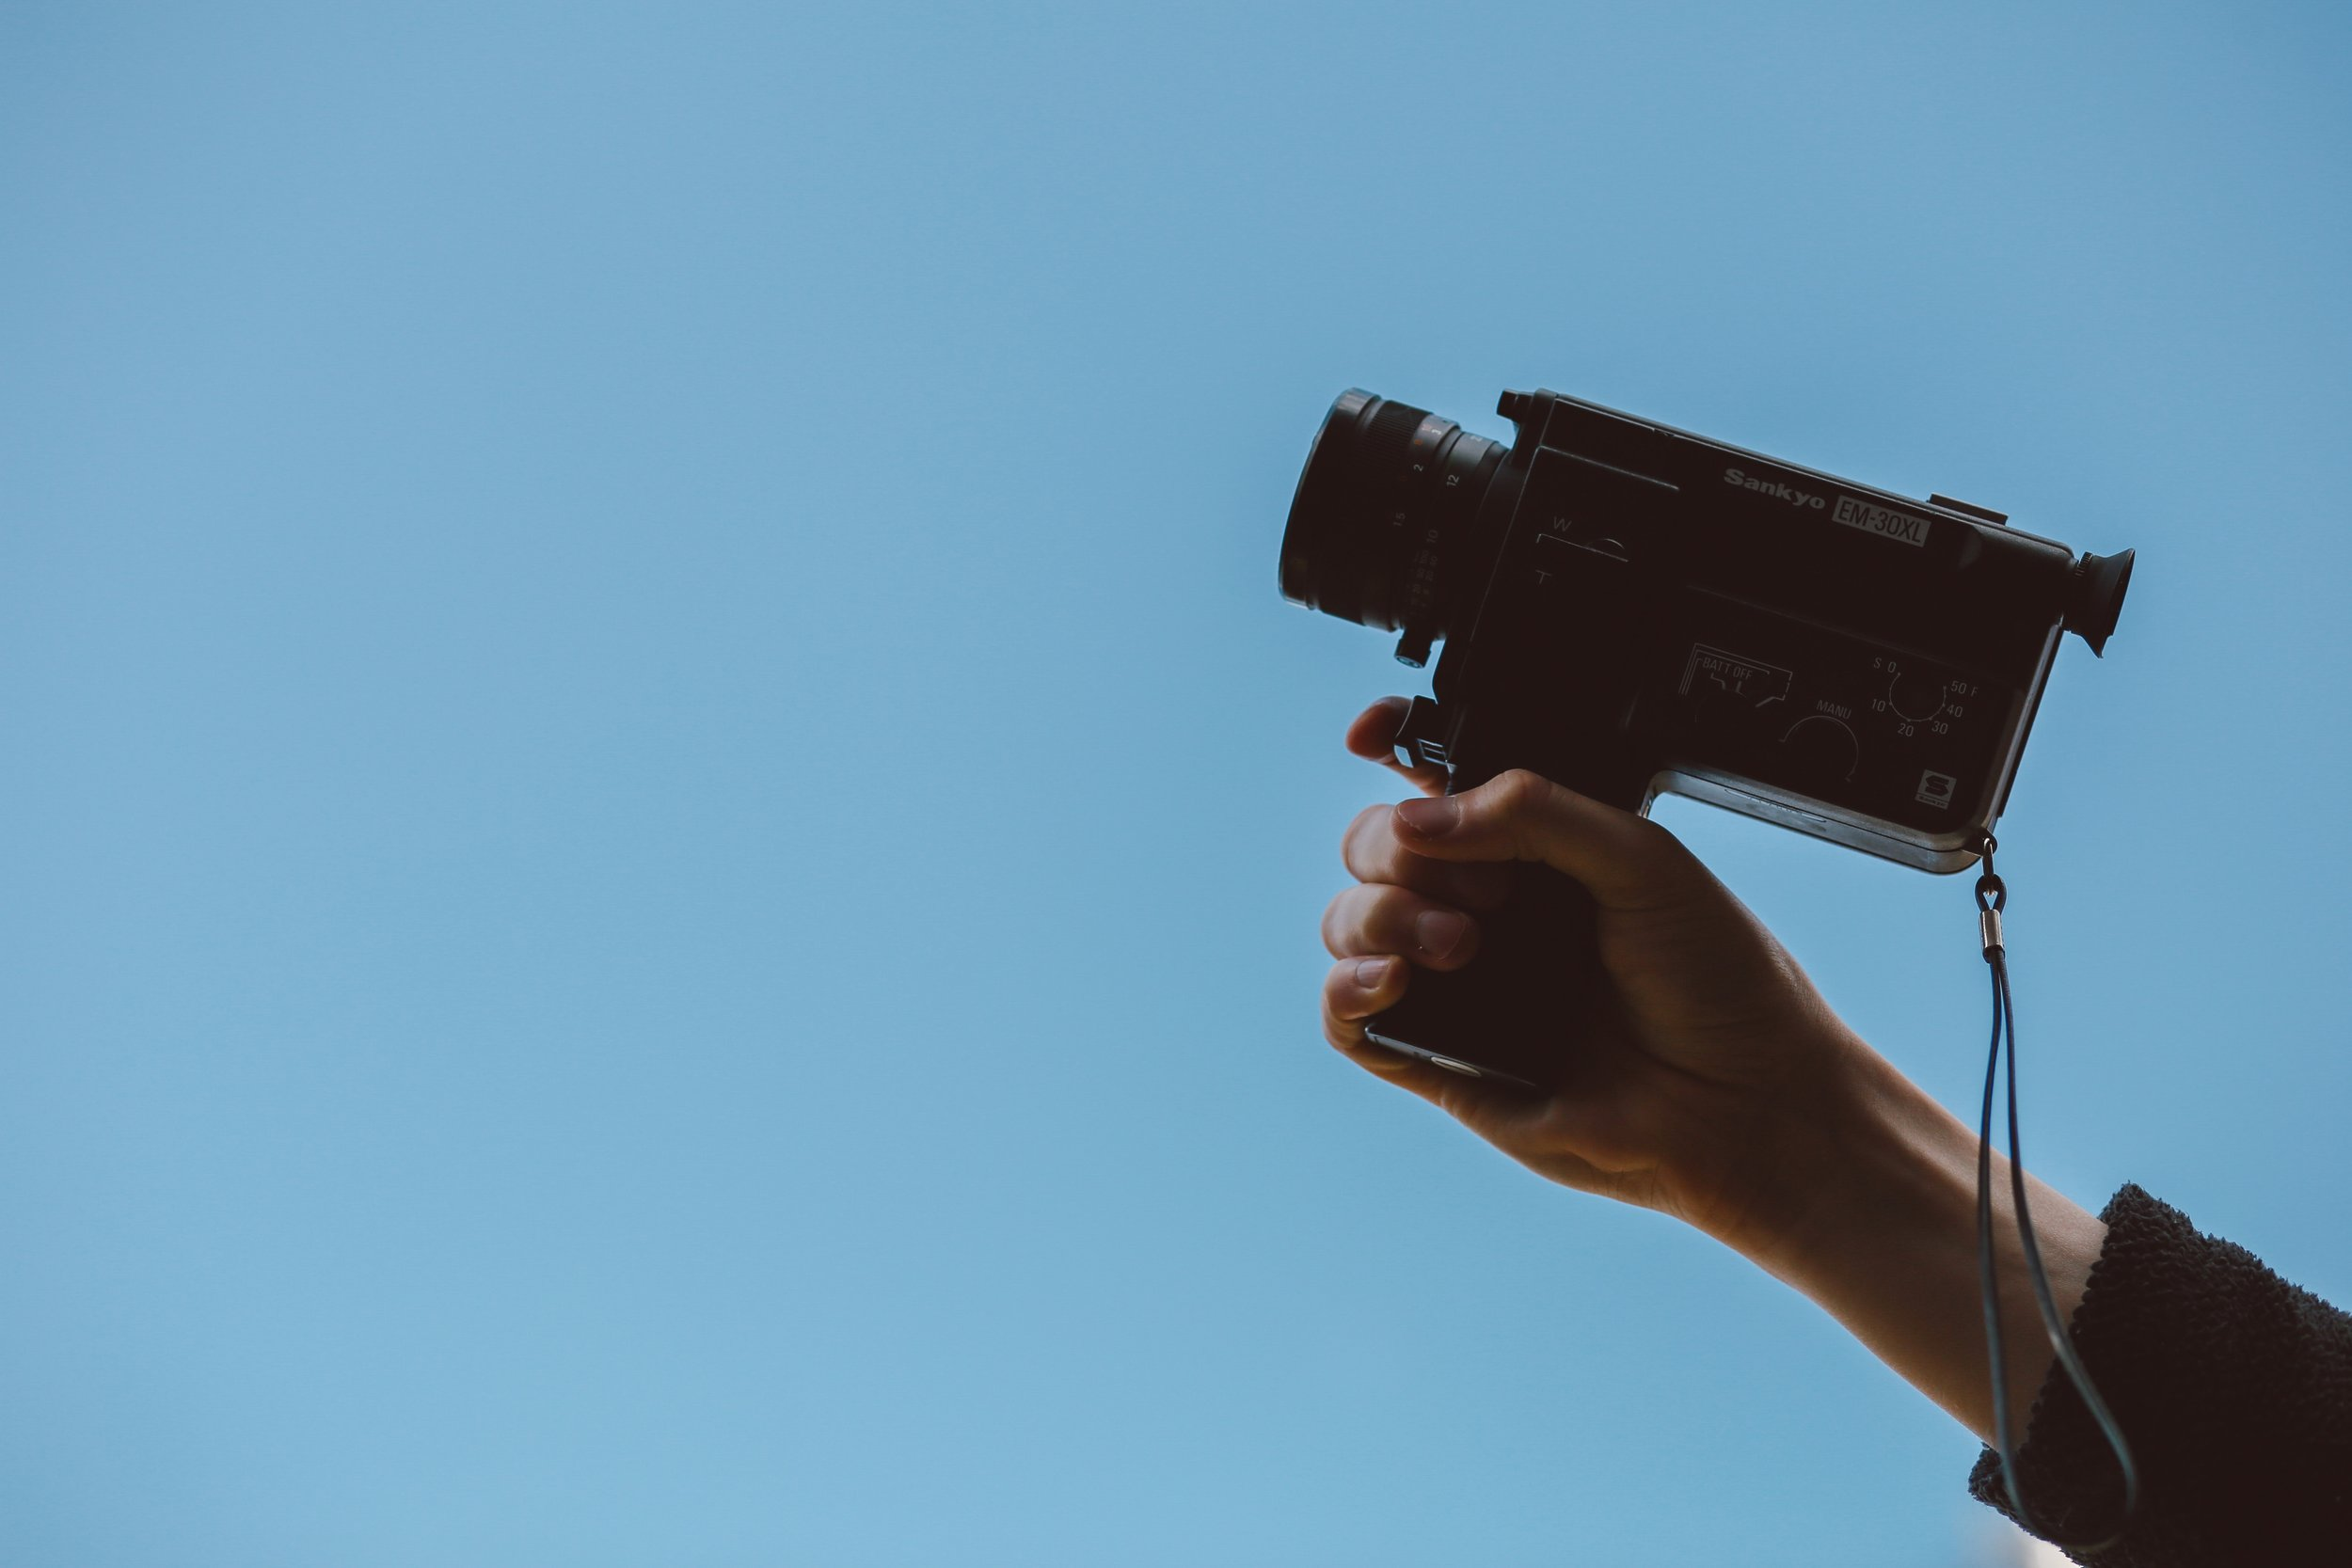 Video camera in a hand.